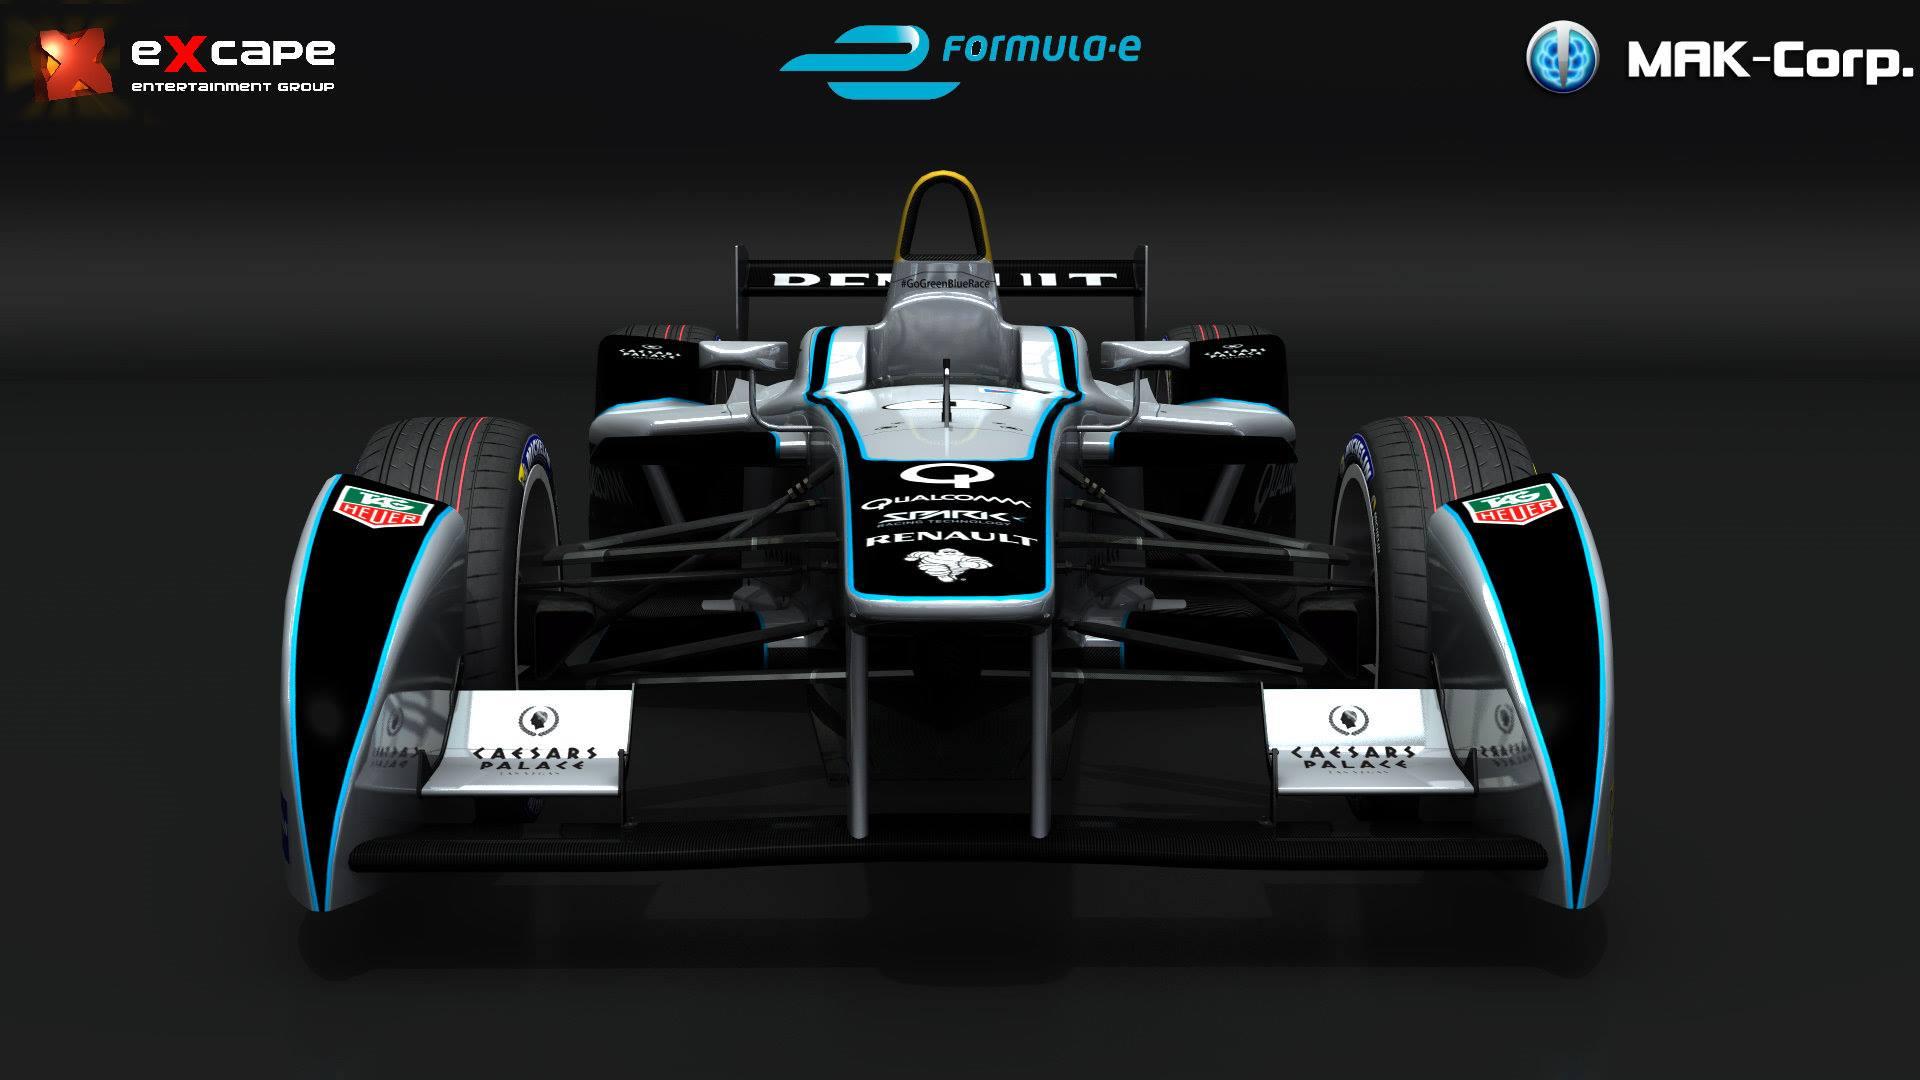 mak corp formula e car unveiled  u2013 virtualr net  u2013 100